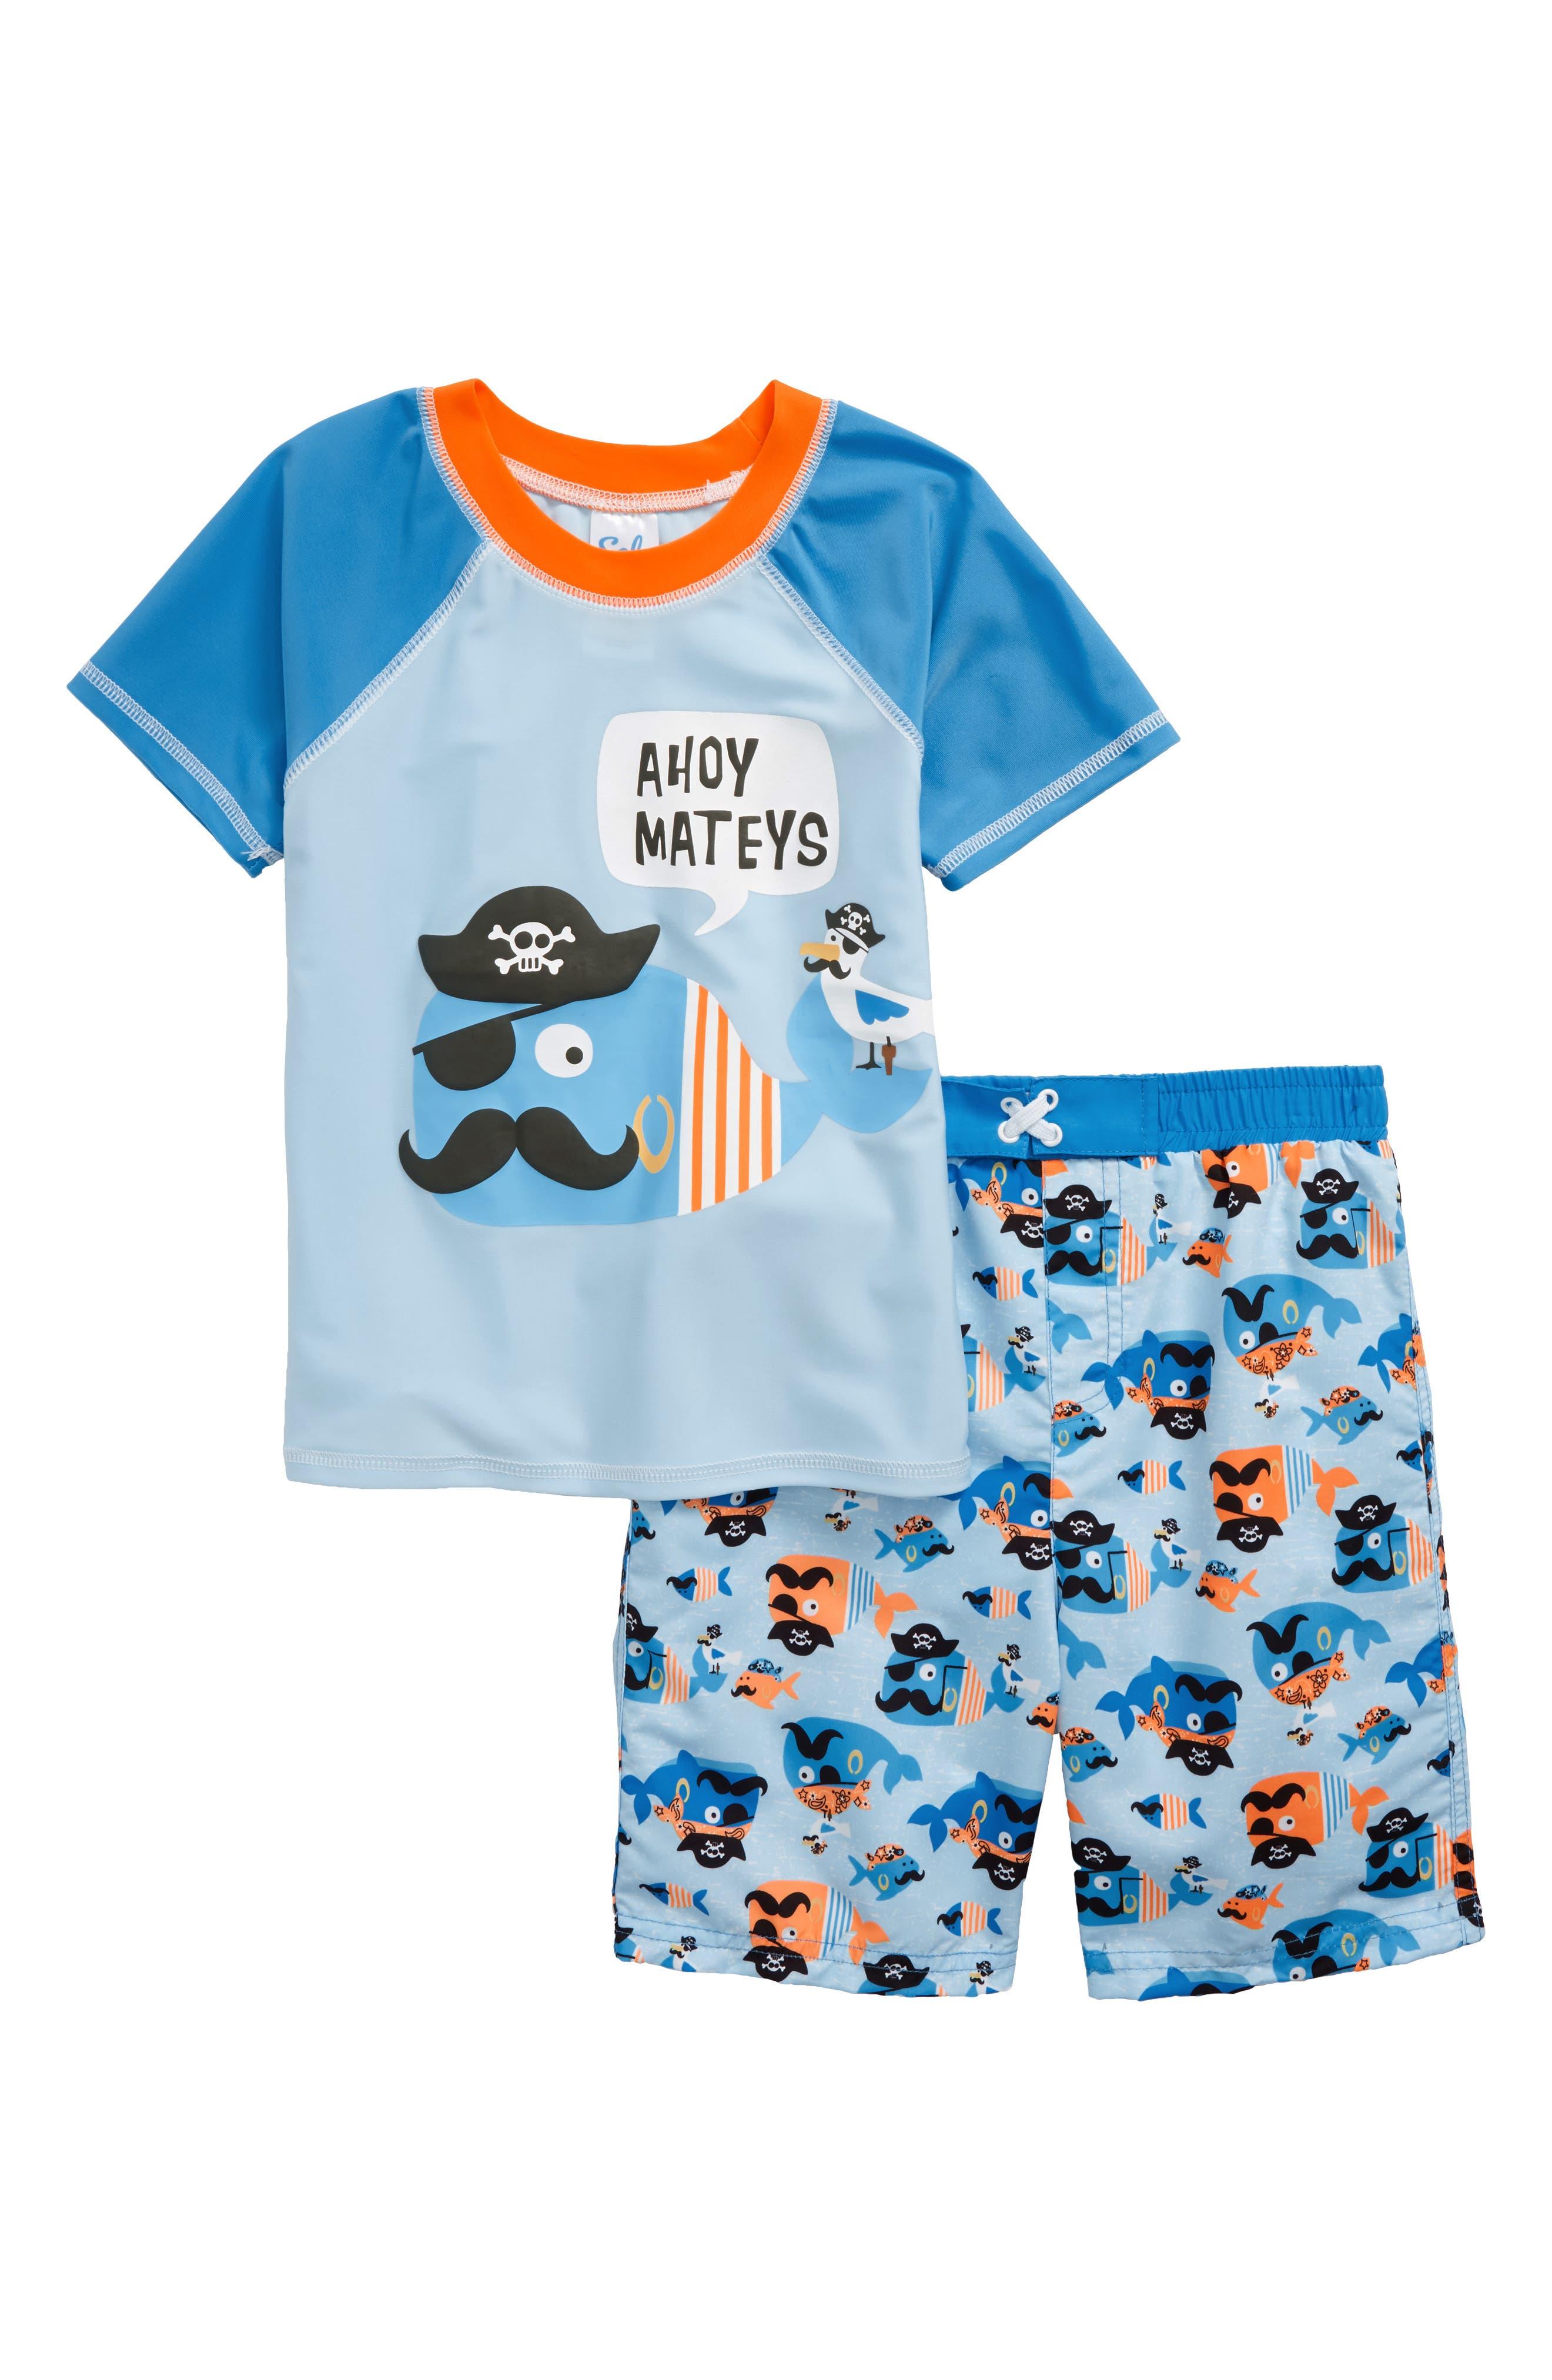 Ahoy Mateys Two-Piece Rashguard Swimsuit,                         Main,                         color, Blue